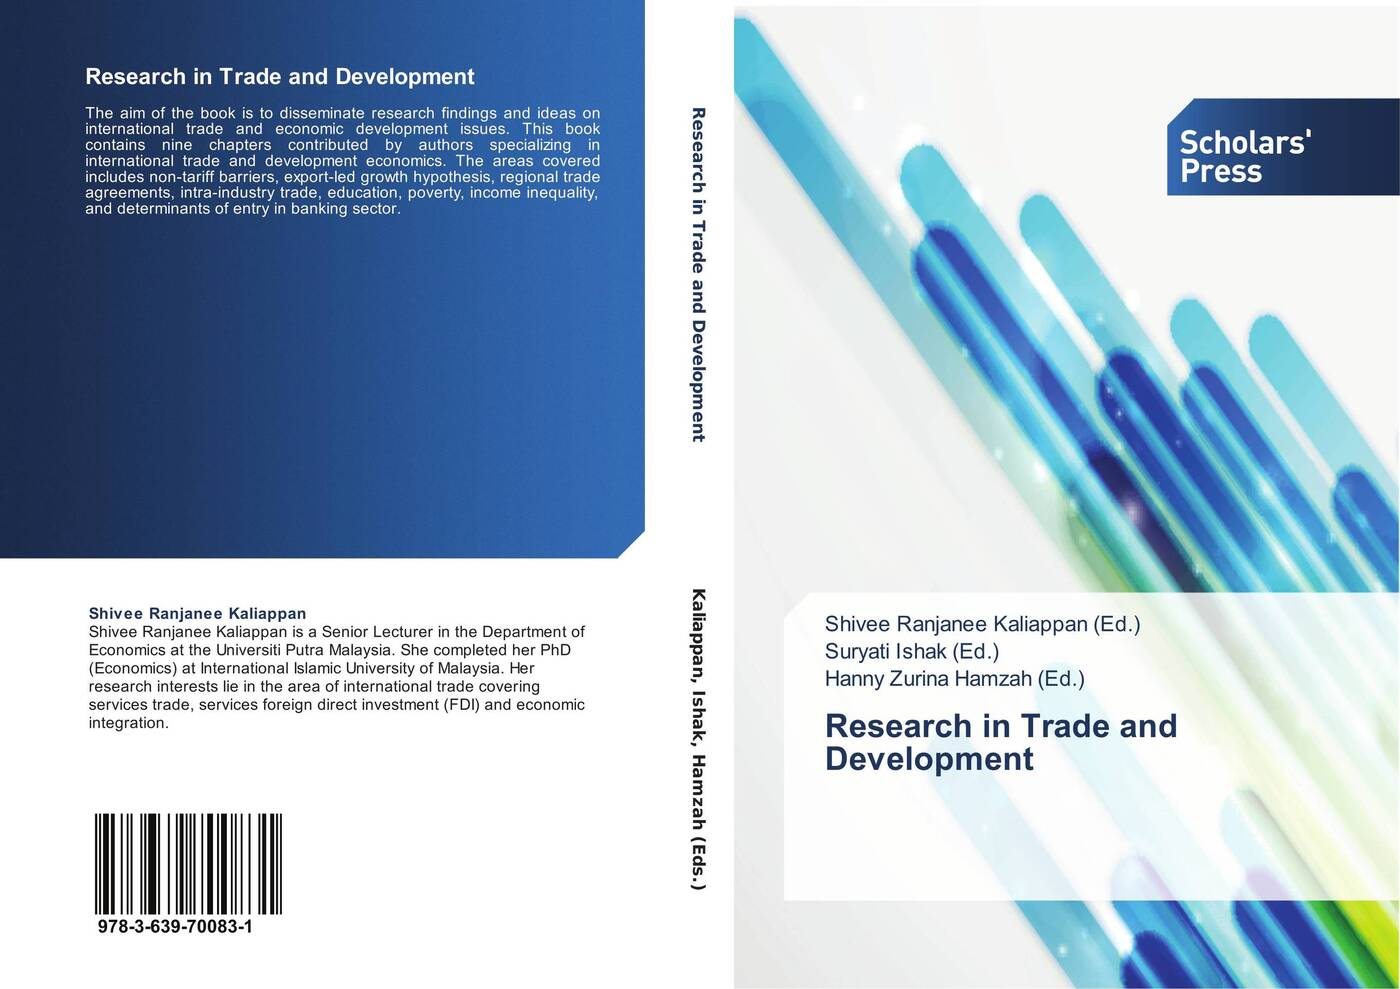 Shivee Ranjanee Kaliappan,Suryati Ishak and Hanny Zurina Hamzah Research in Trade and Development international trade and agriculture